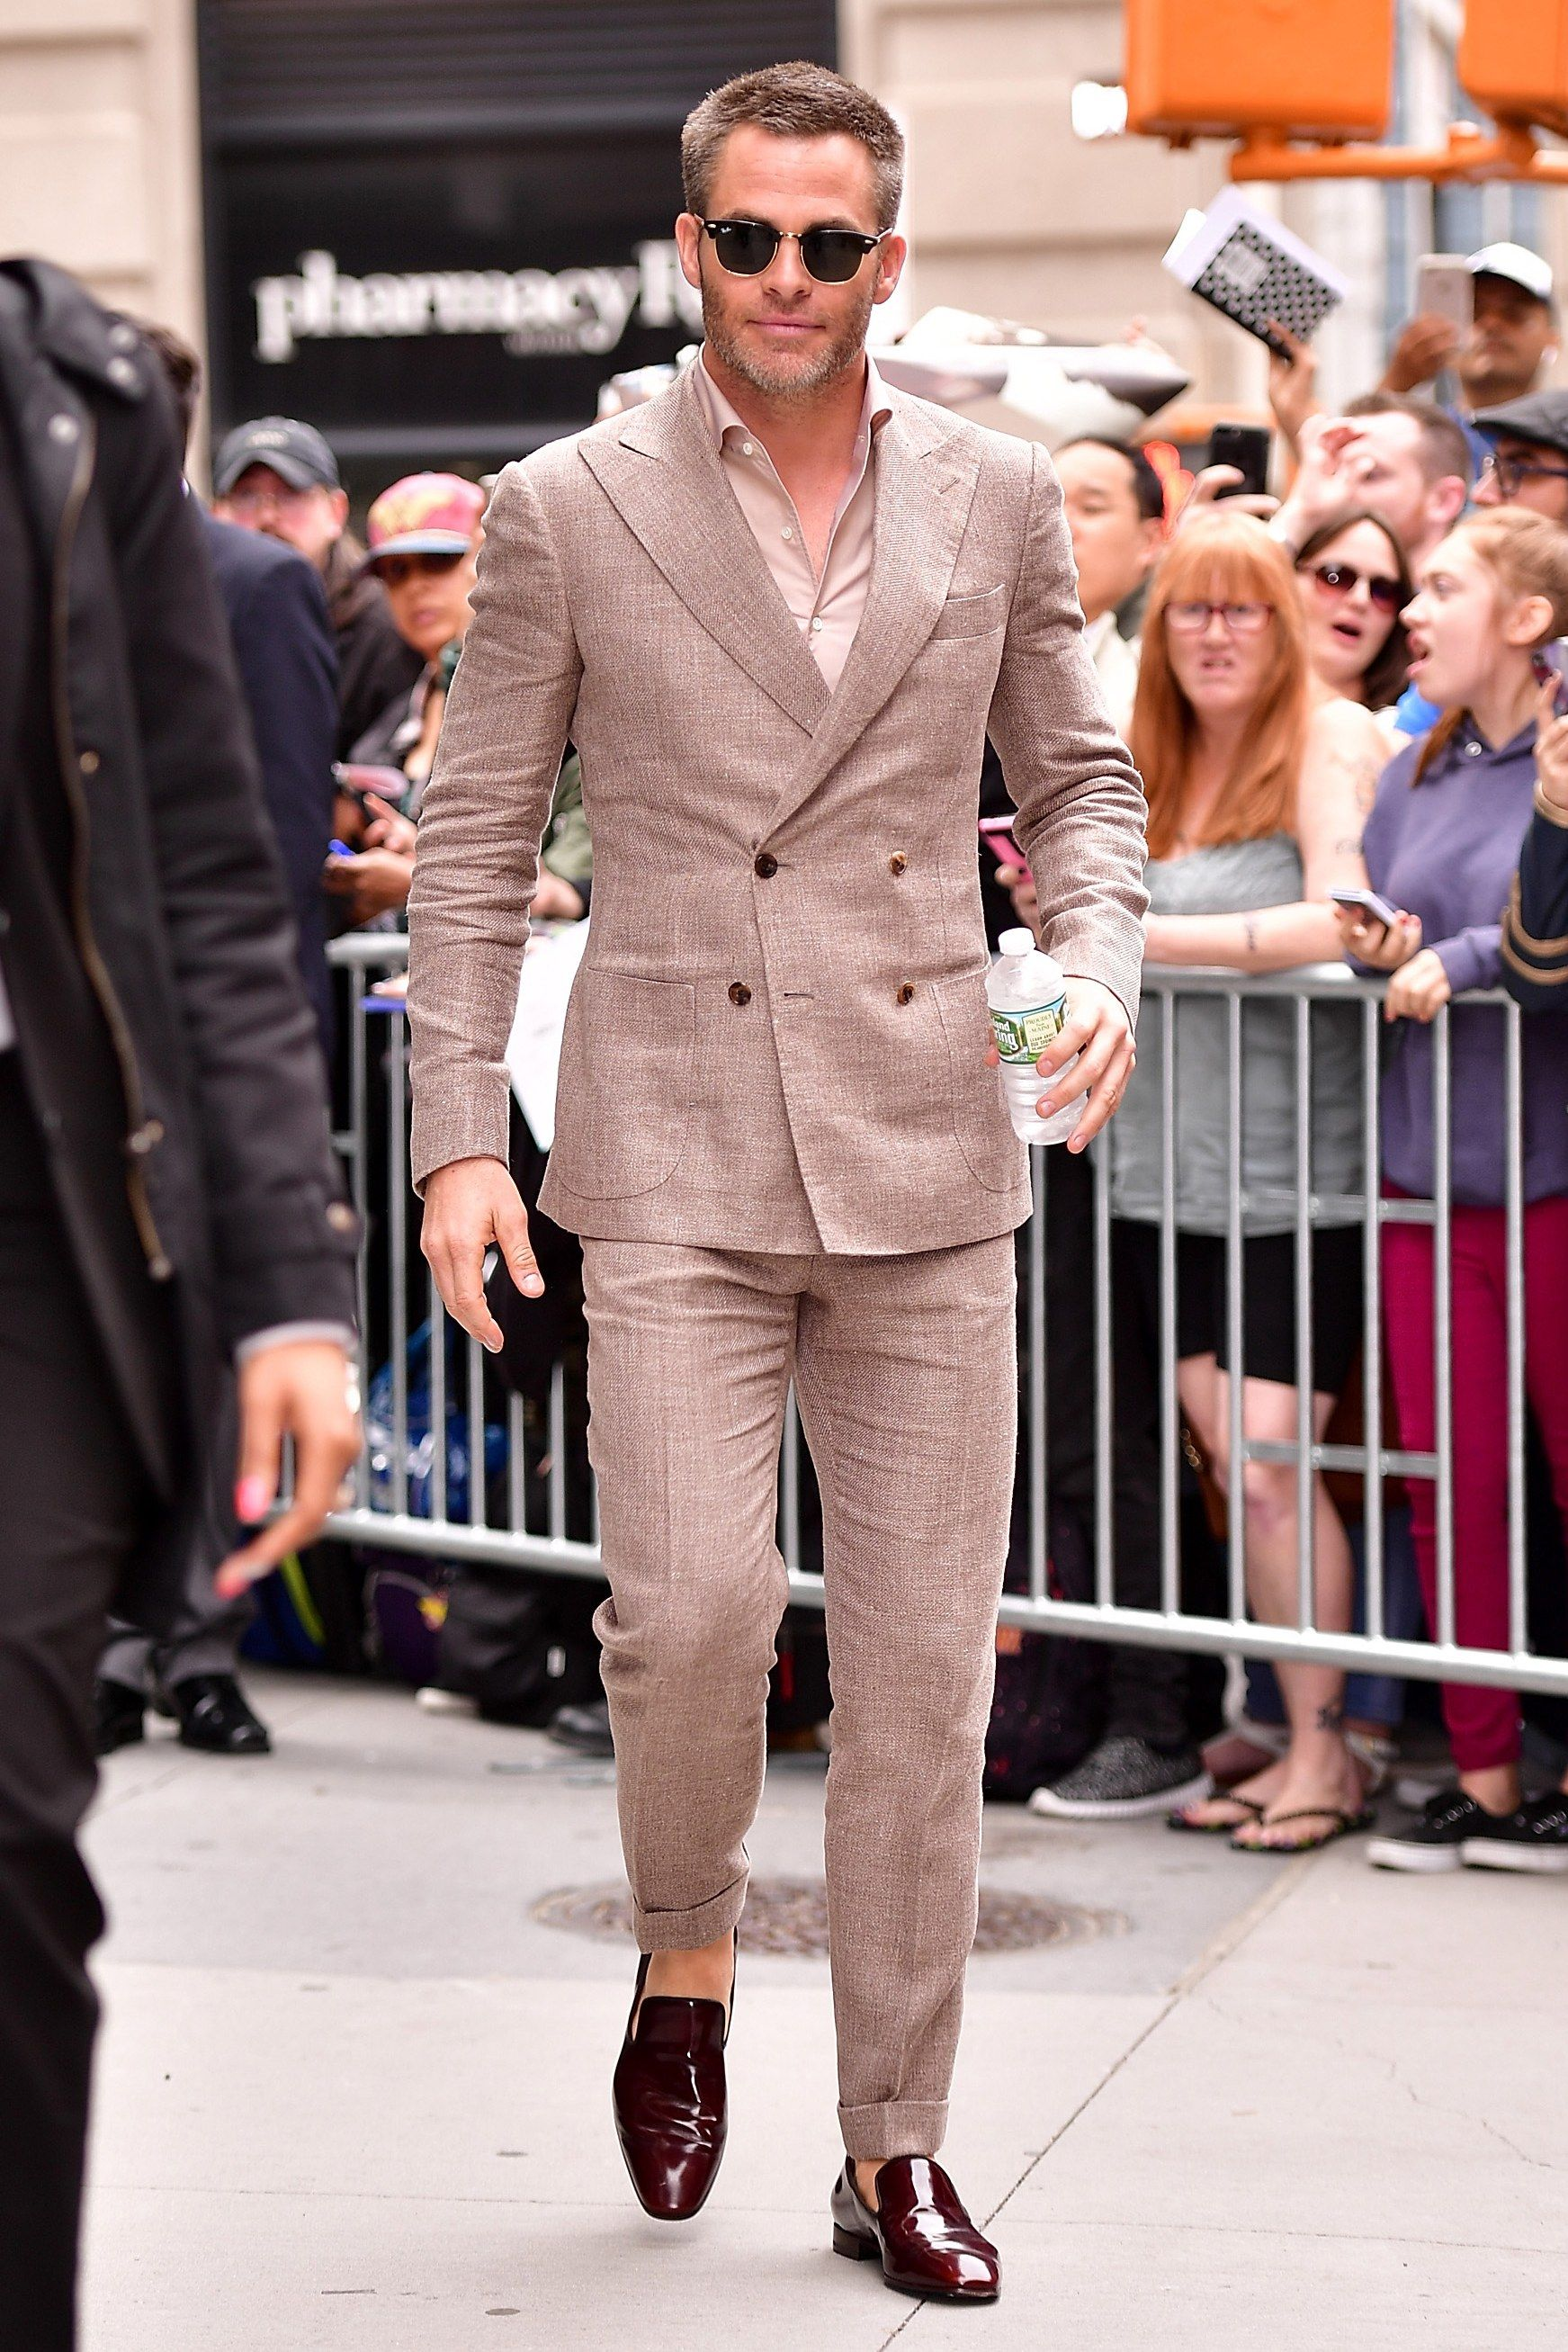 How To Wear A Summer Suit Like a Pro | Pinterest | Moda masculina ...